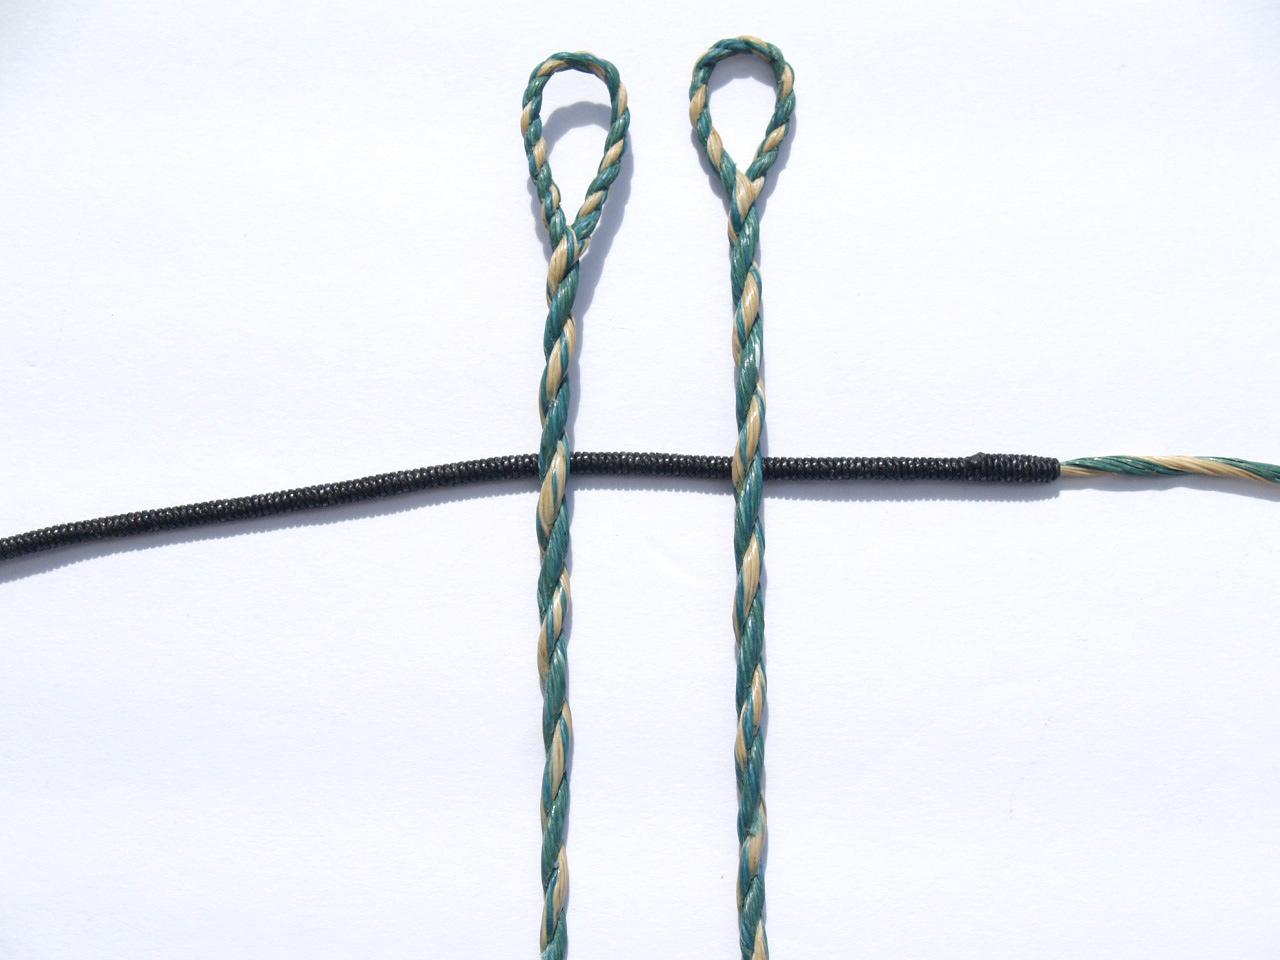 Mercury Flemish Twist Bowstring